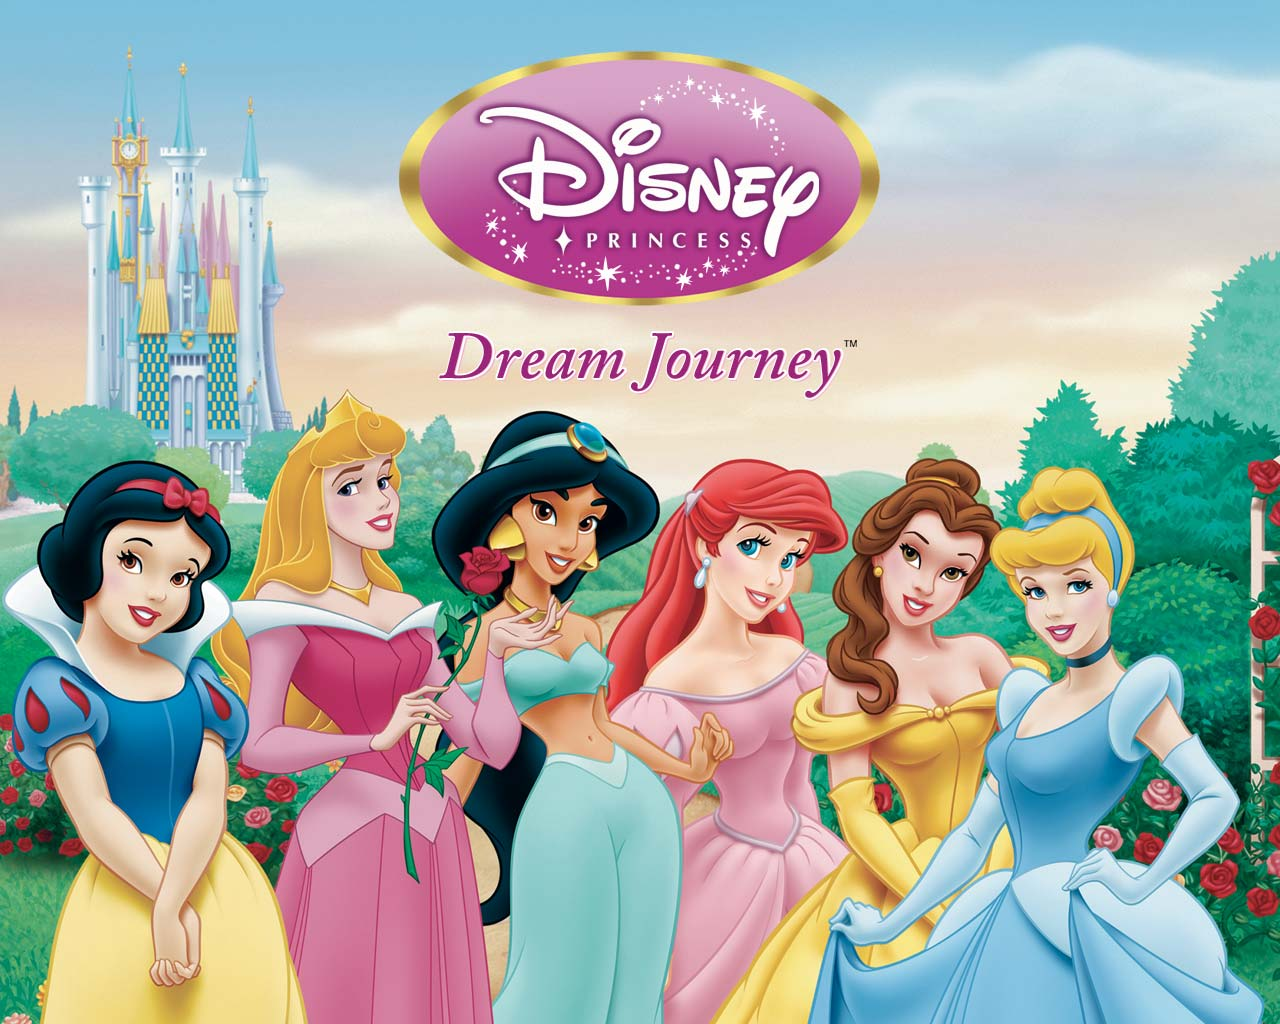 http://1.bp.blogspot.com/-u1wizS51FUU/UEQ6uQU19eI/AAAAAAAACUw/MSRbmVEl6N8/s1600/Disney%2BPrincess%2BWallpapers%2BHD%2B3.jpeg